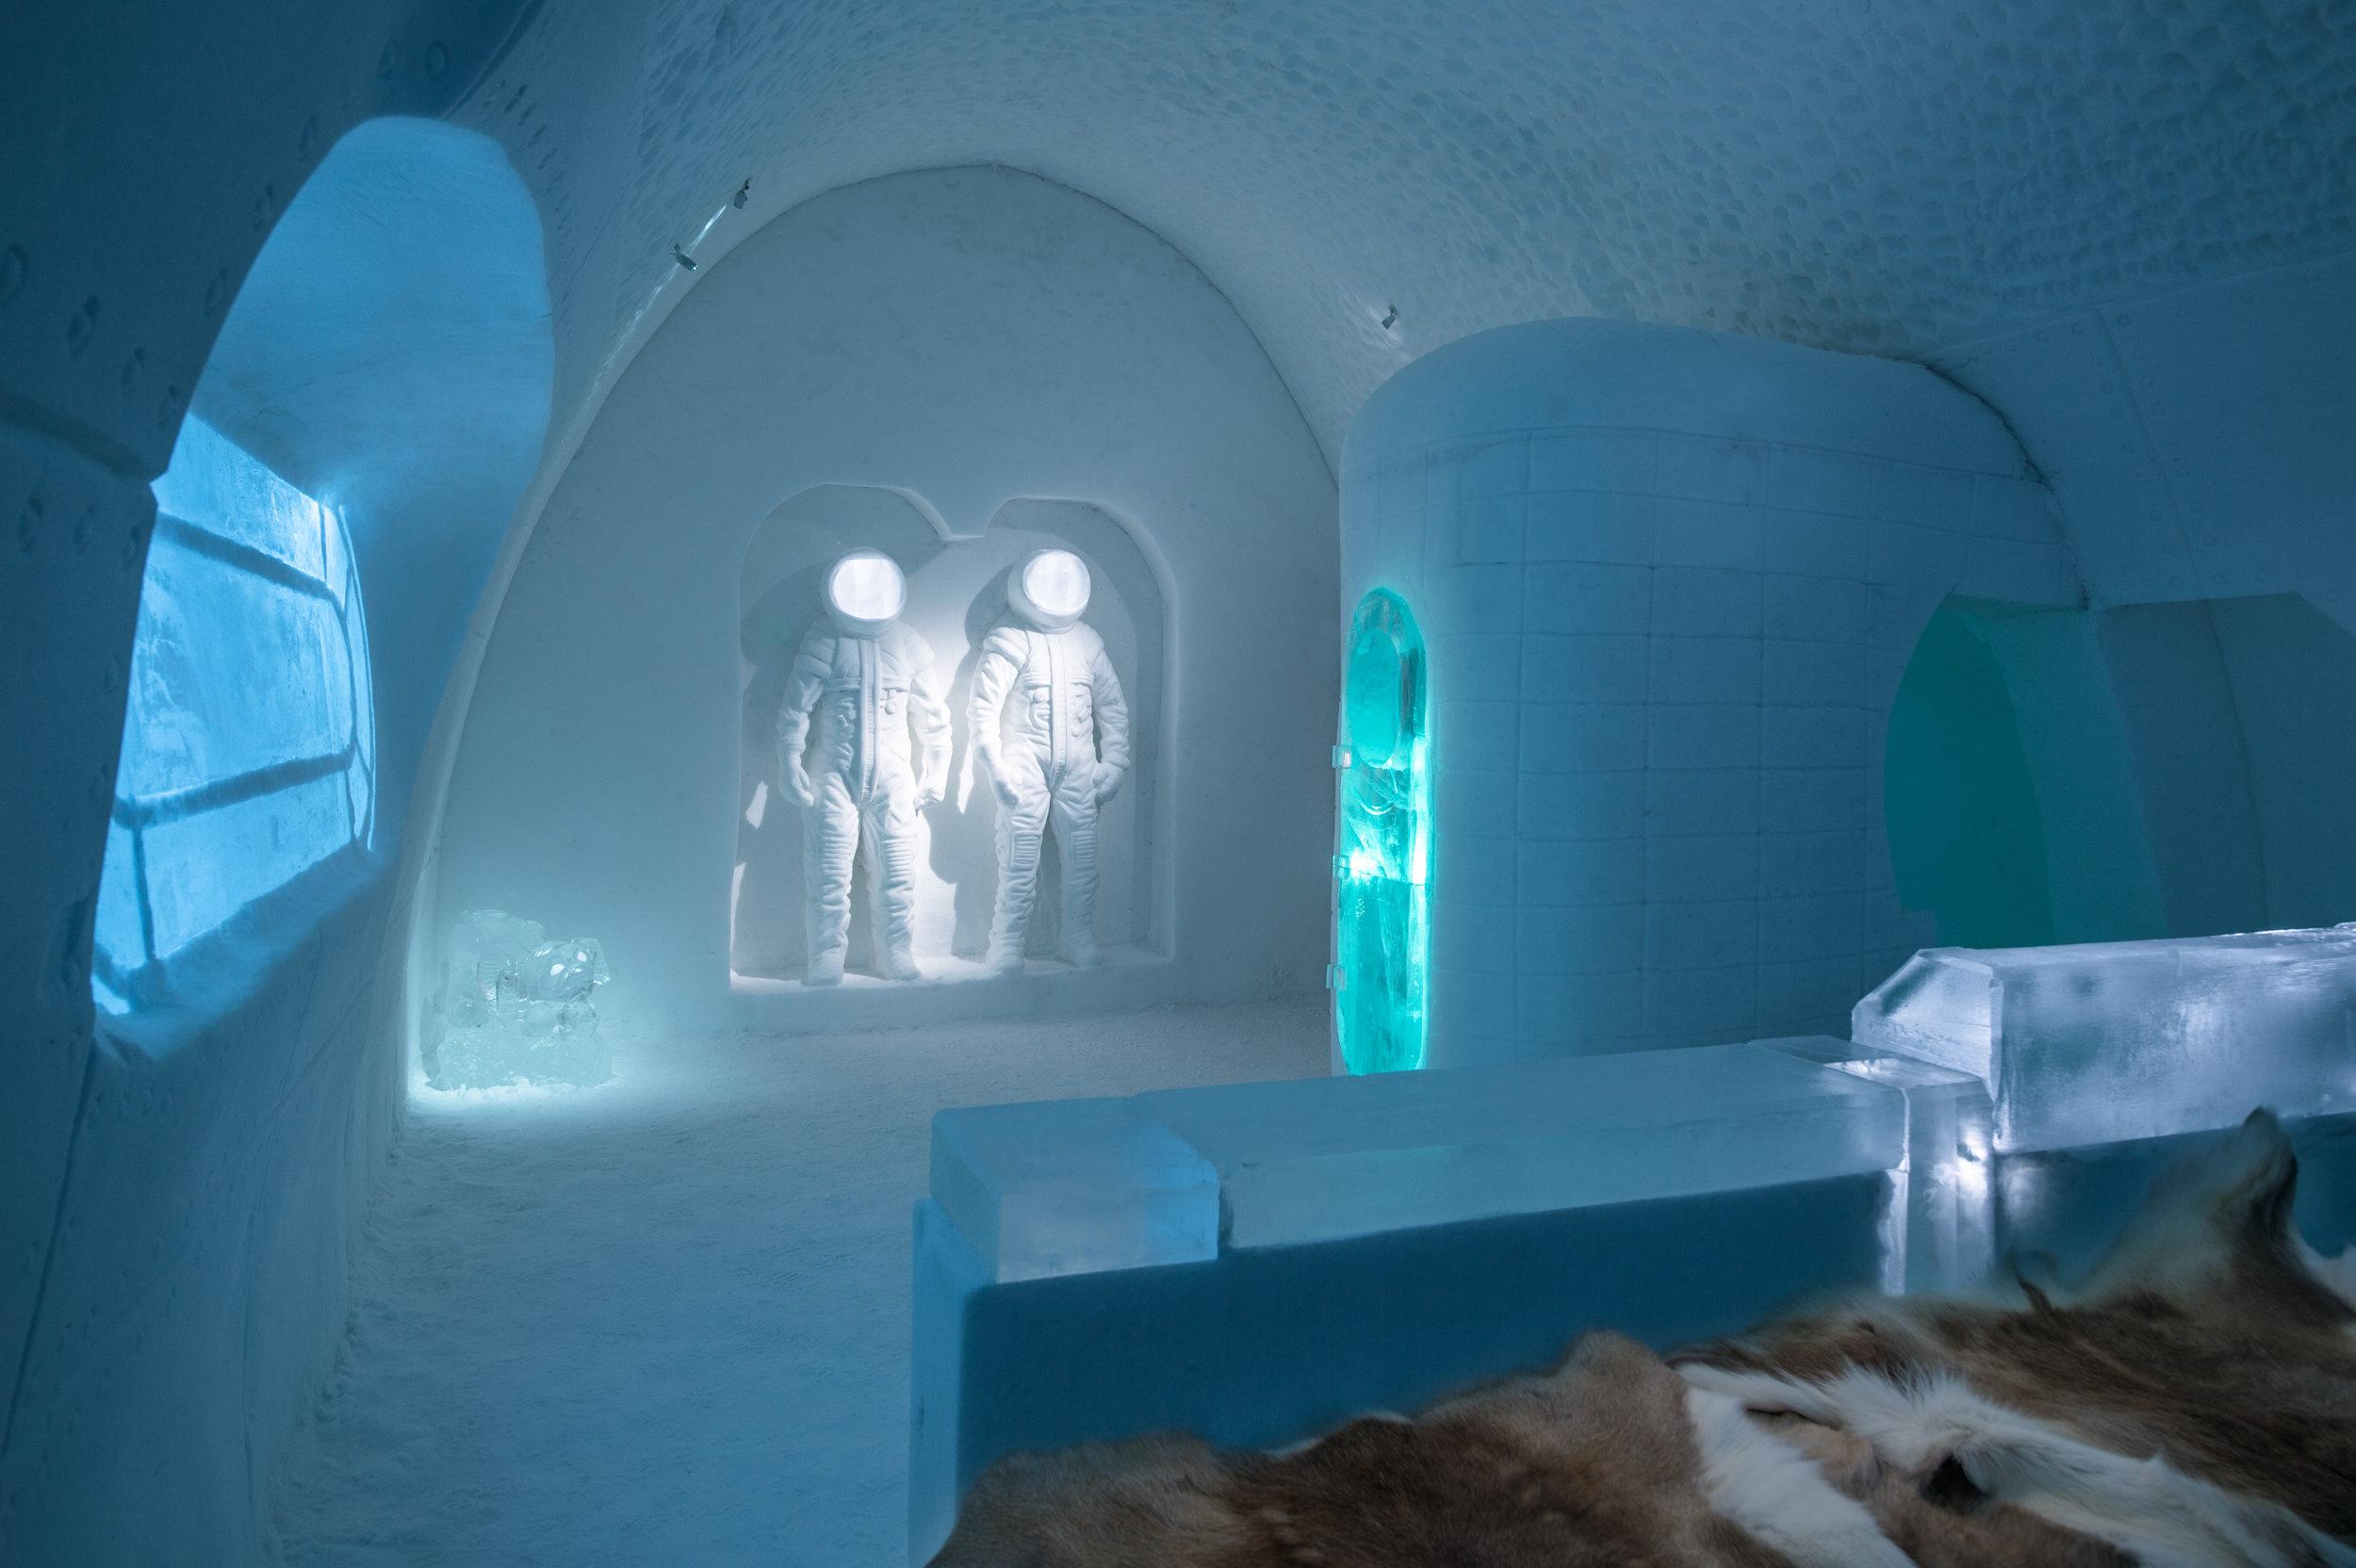 Art suite - Space Room, Adrian BoisPablo Lopez. ICEHOTEL 28  Photo by - Asaf Kliger.jpg